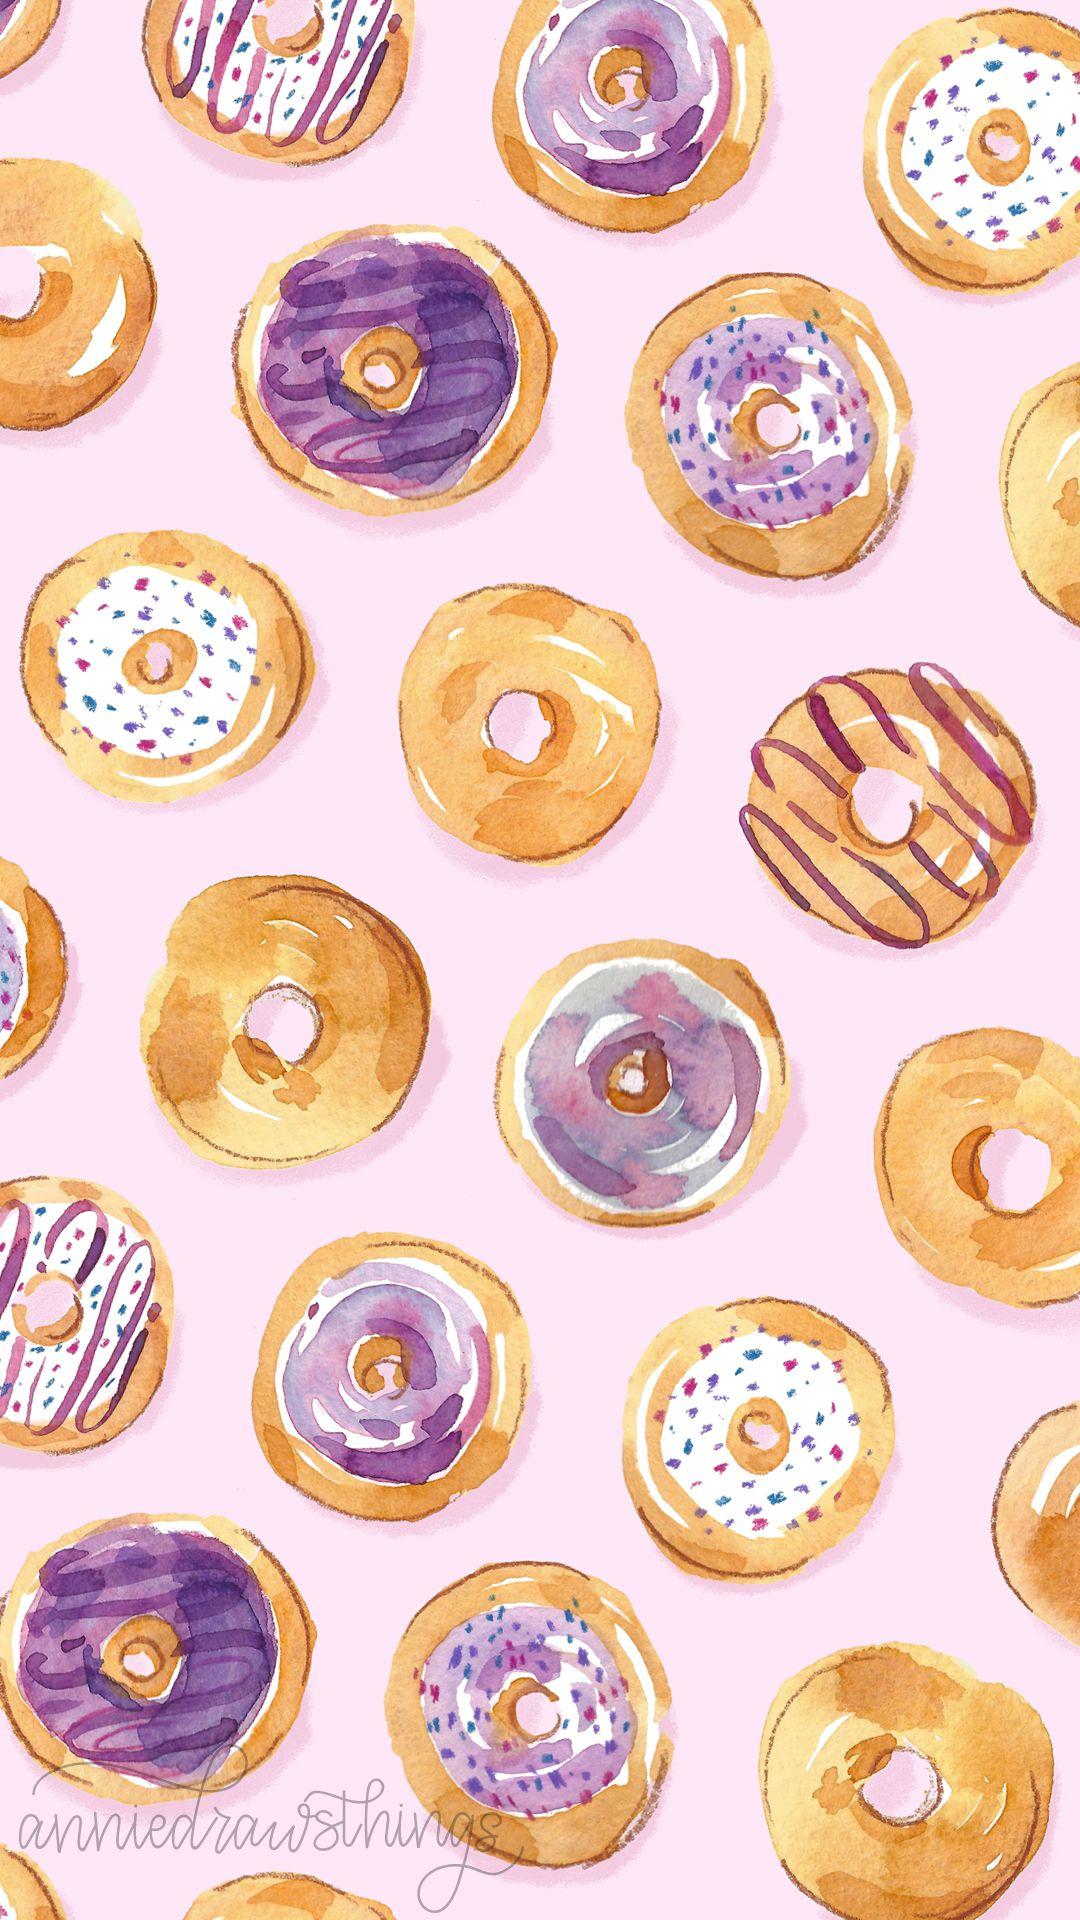 Cute Watercolor Donut Wallpaper Annie Parsons Wallpaper Purple Watercolor Watercolor Wallpaper